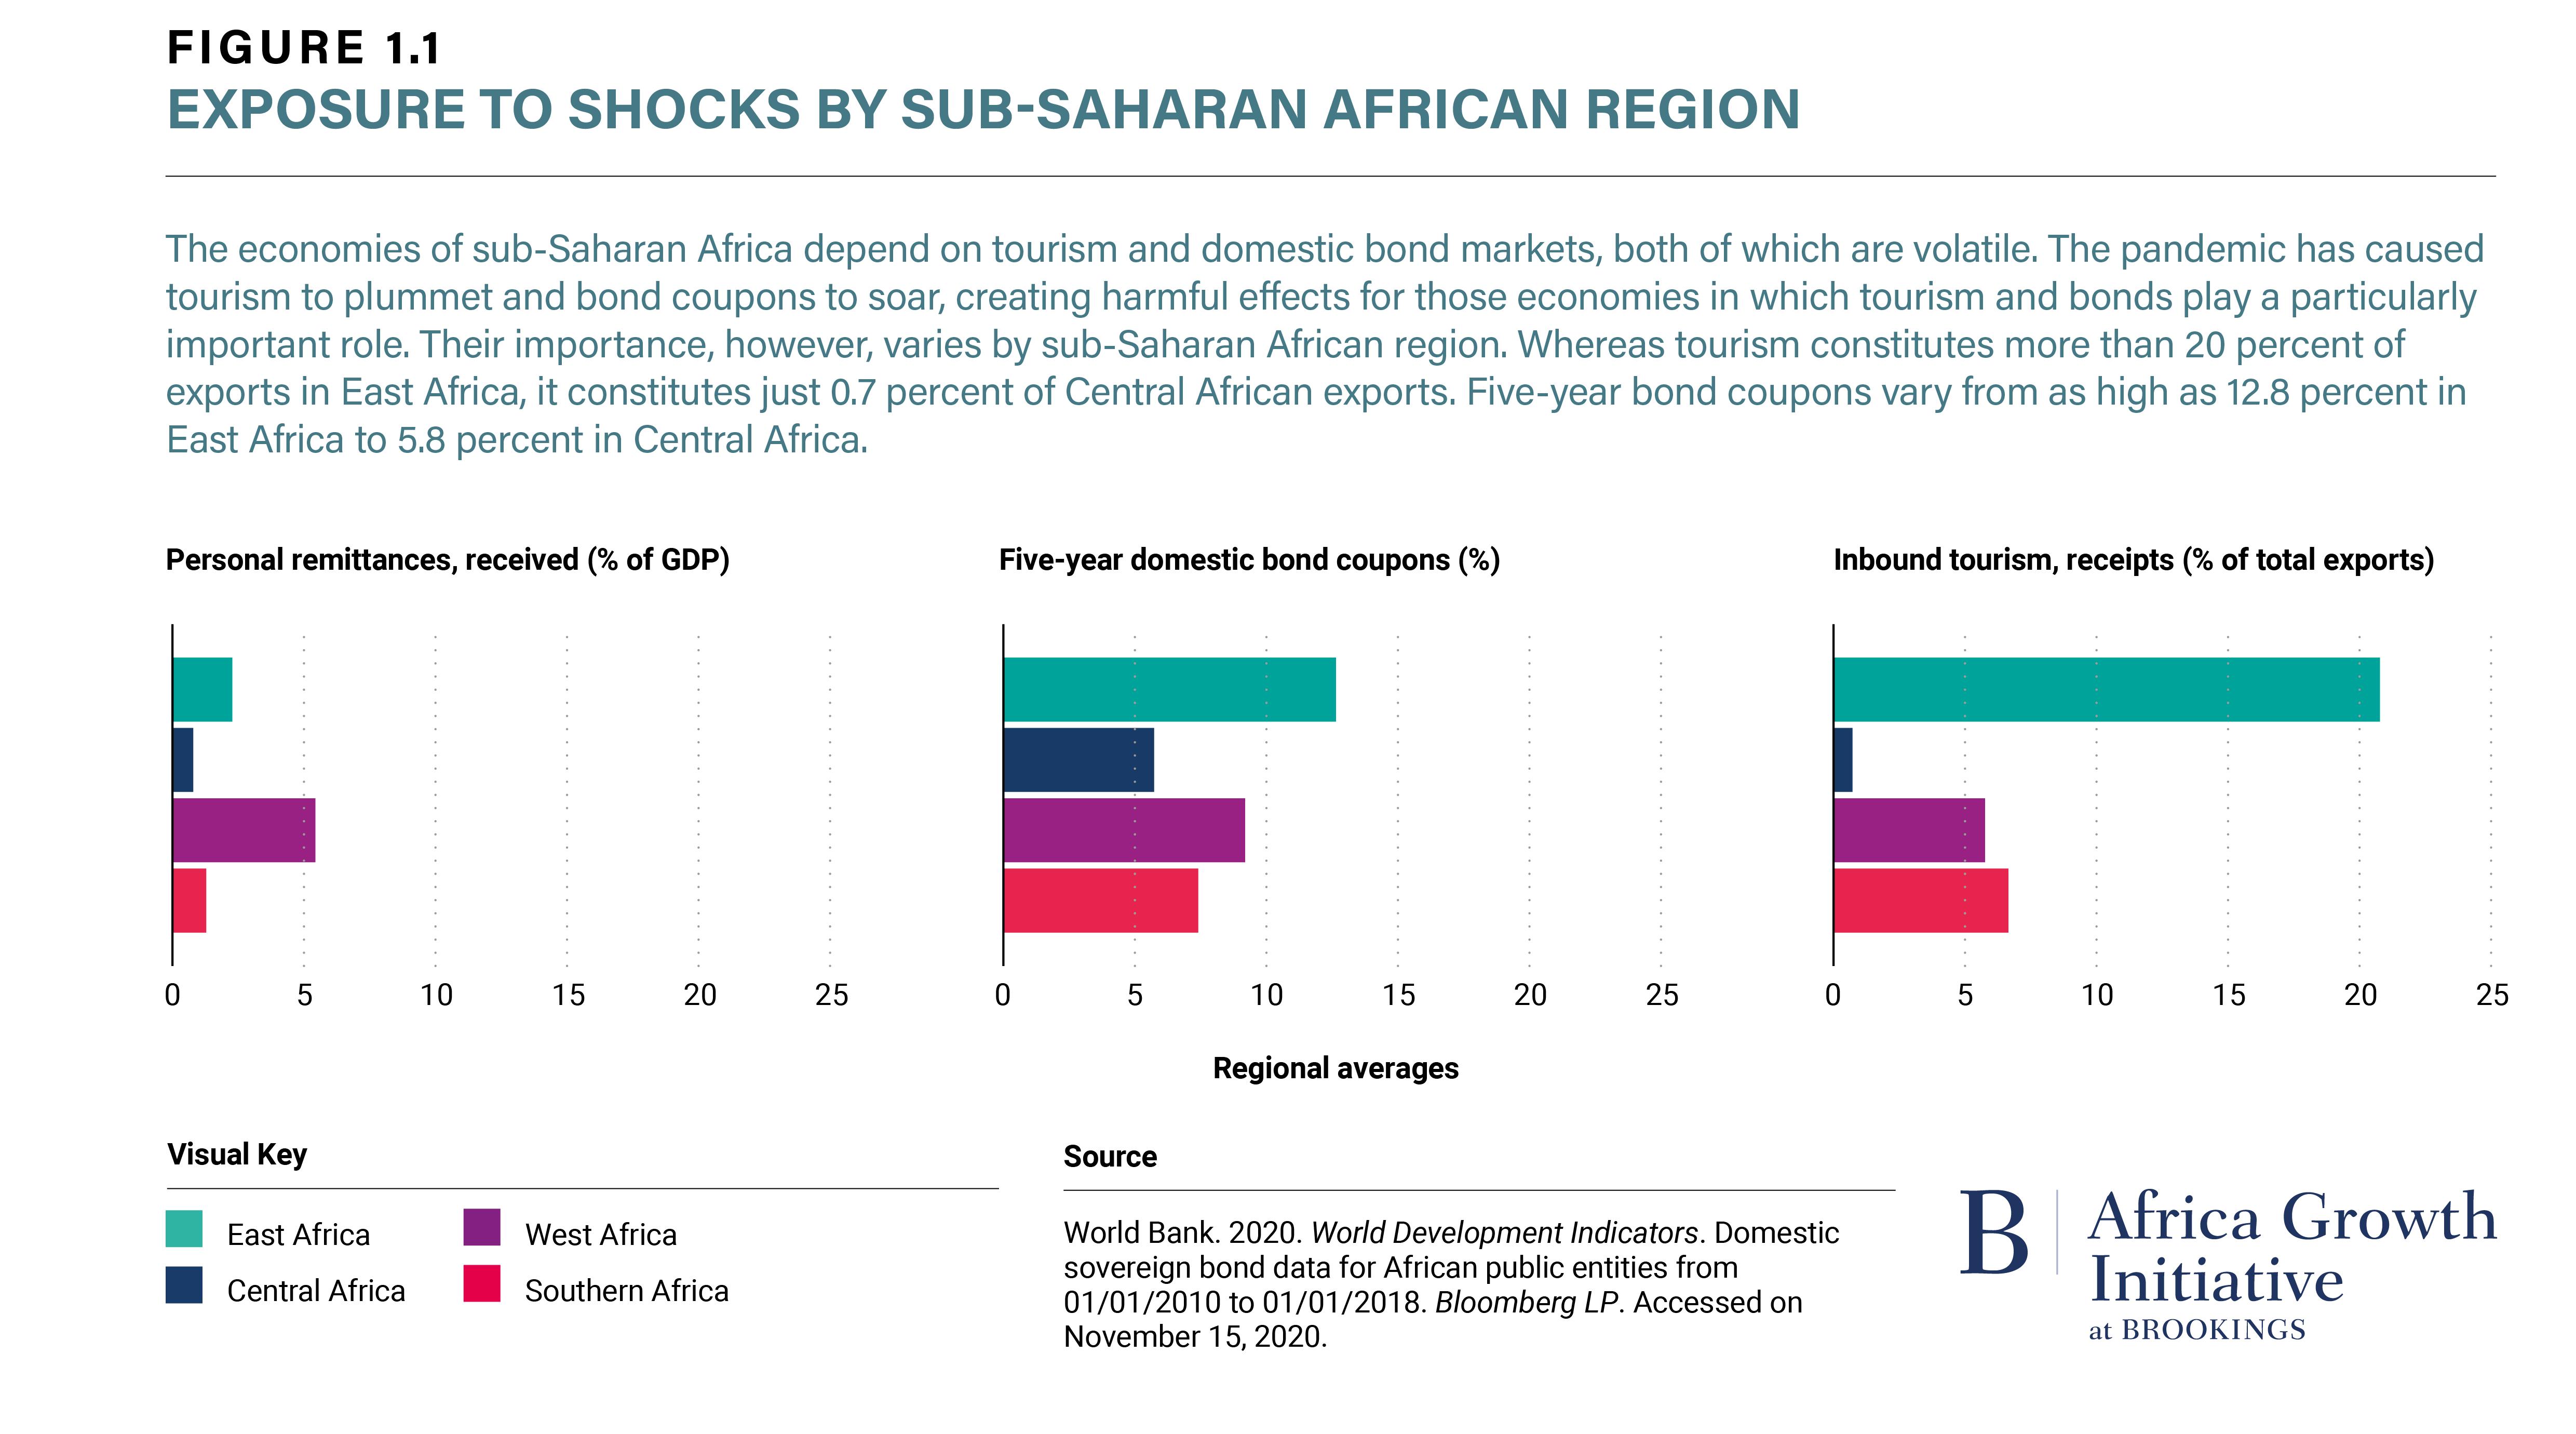 Figure 1.1 Exposure to Shocks by Sub-Saharan African Region